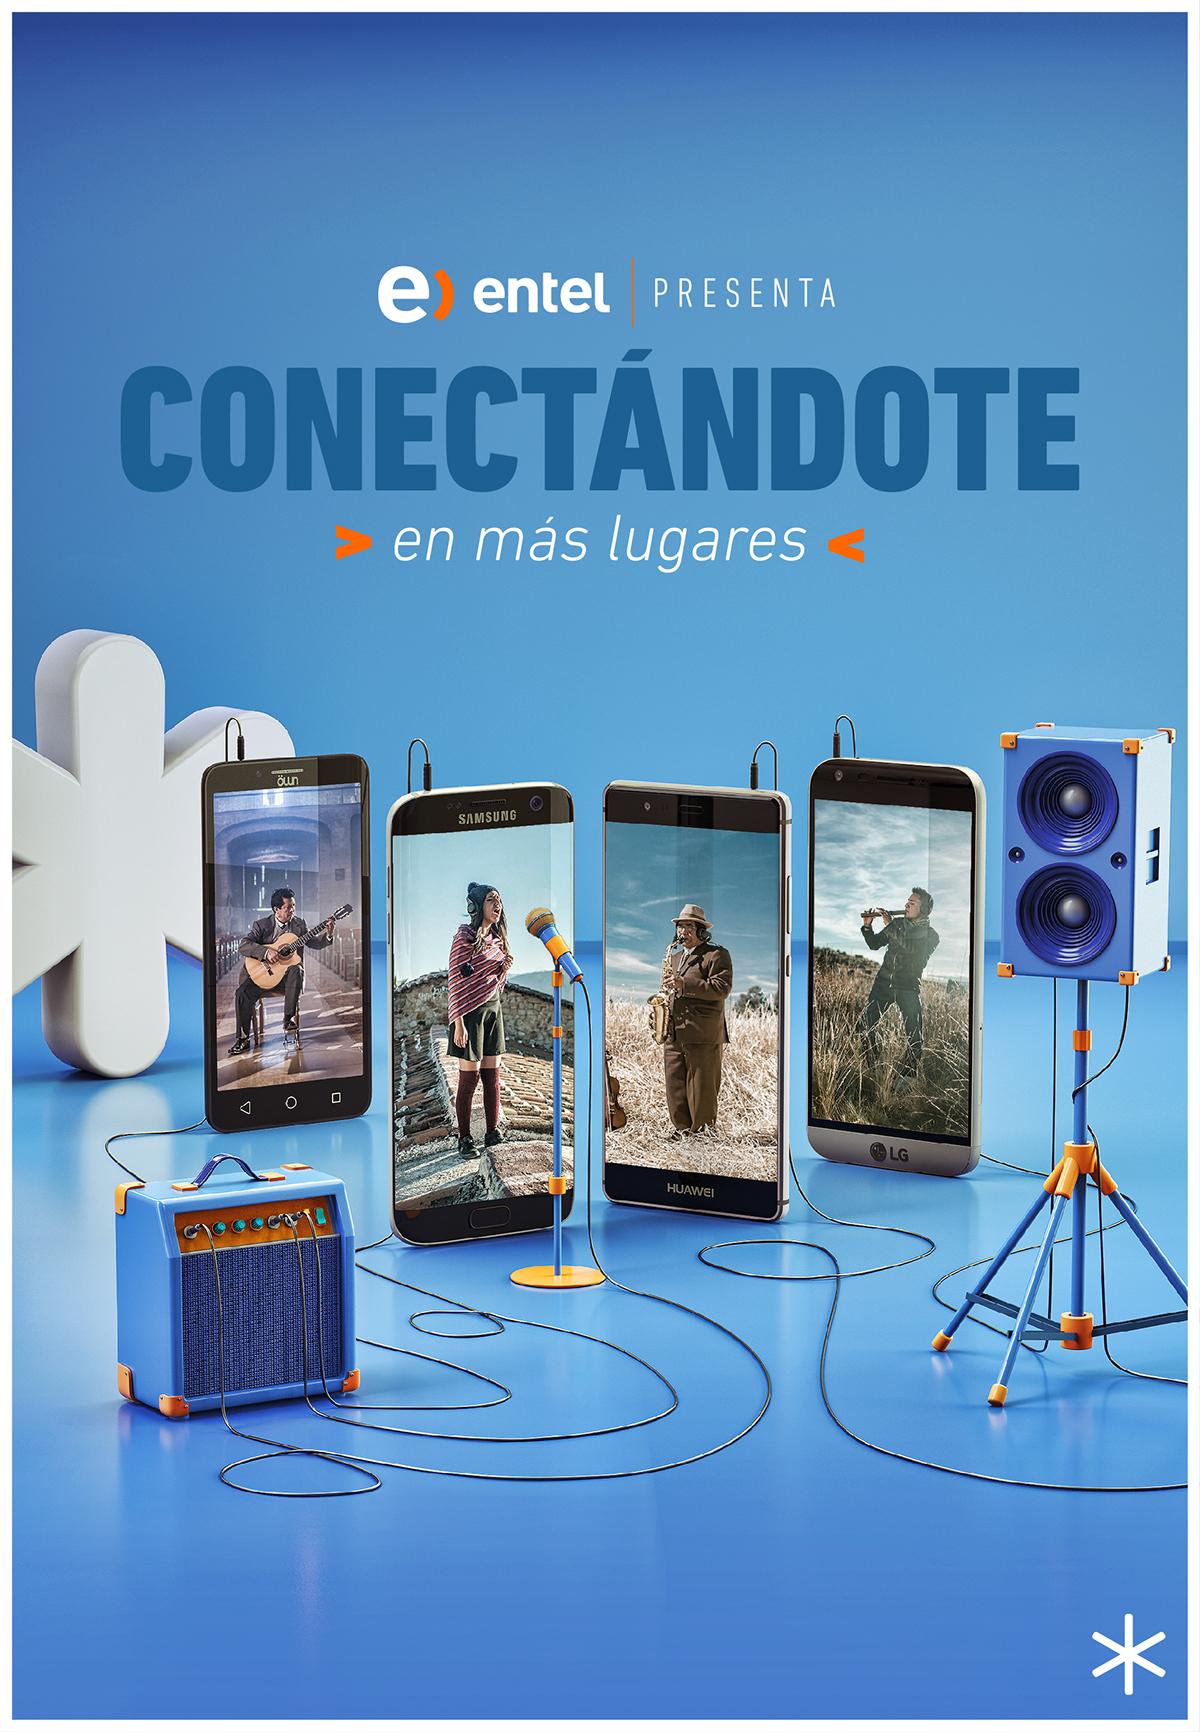 coverage 4g telecomunications Video Call Advertising  entel Film   documental